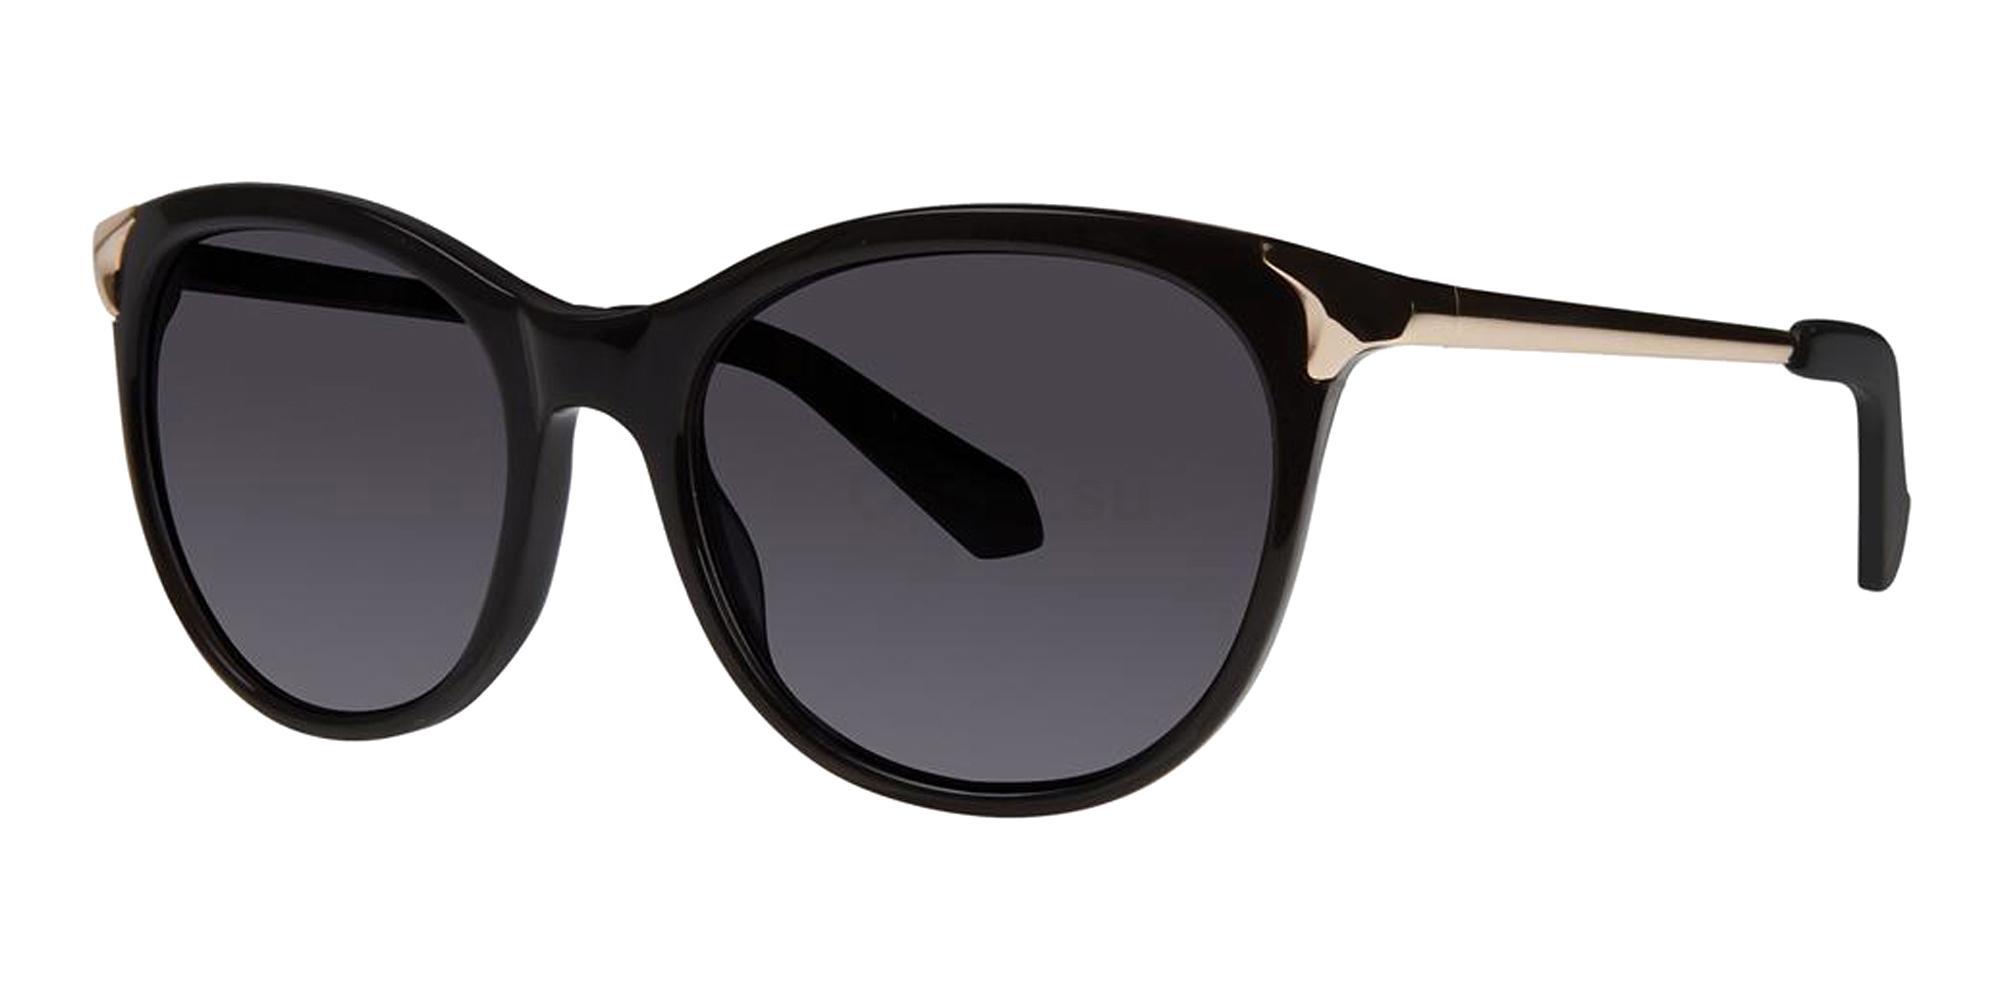 Black JOHANNA Sunglasses, Zac Posen